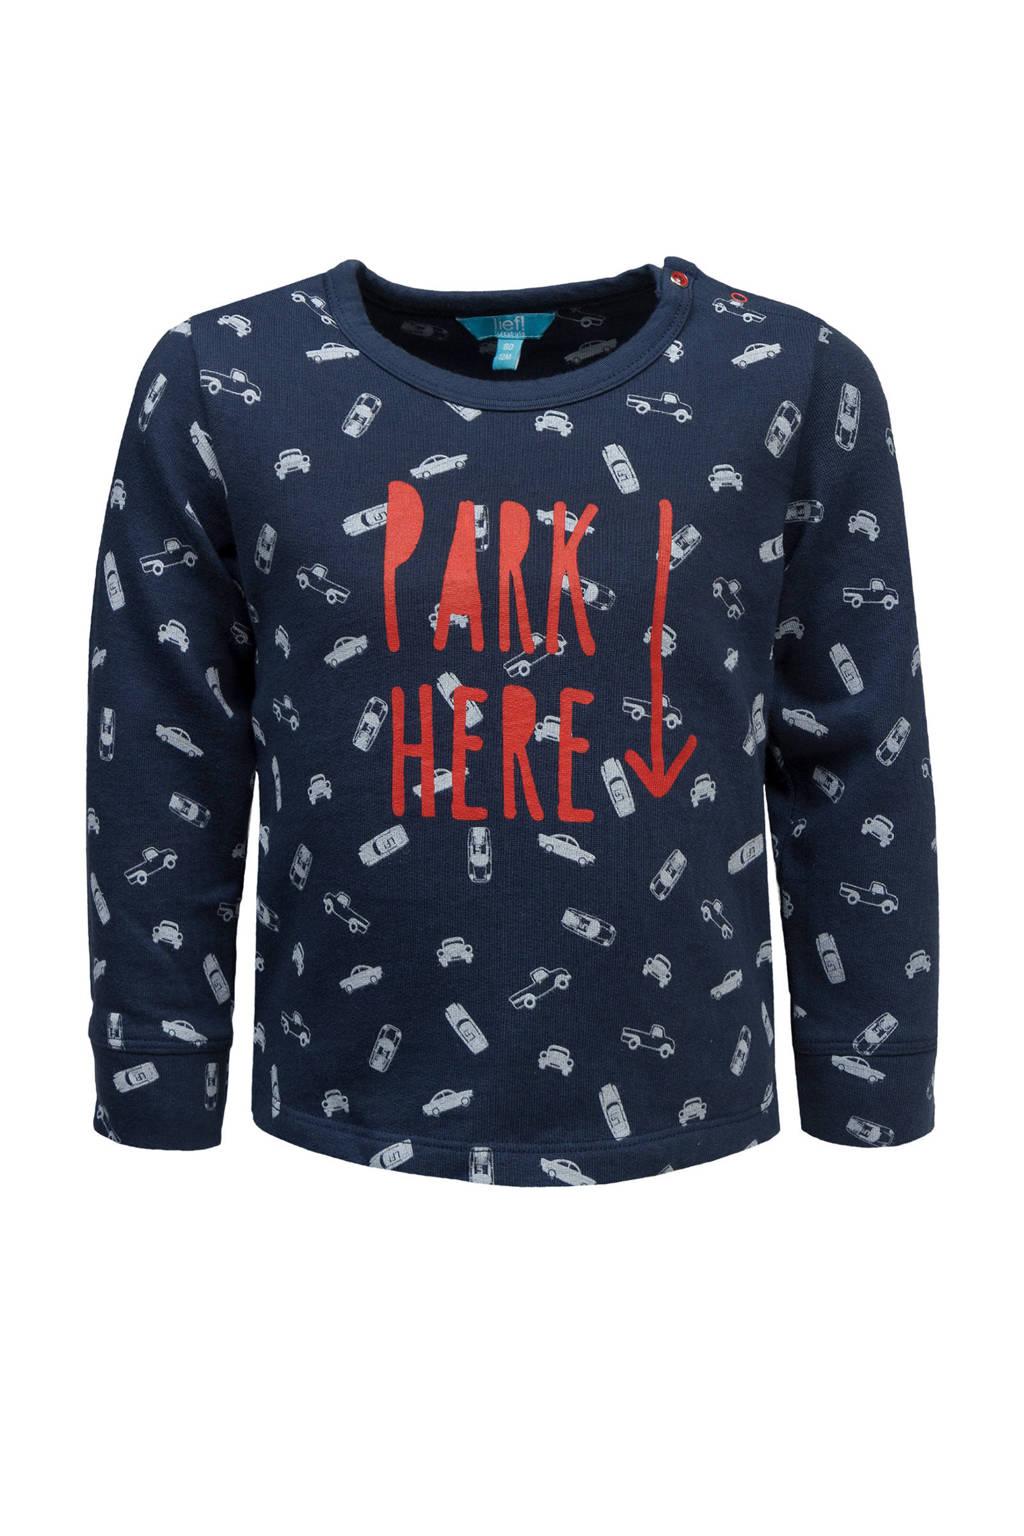 lief! sweater met auto's blauw, Donkerblauw/rood